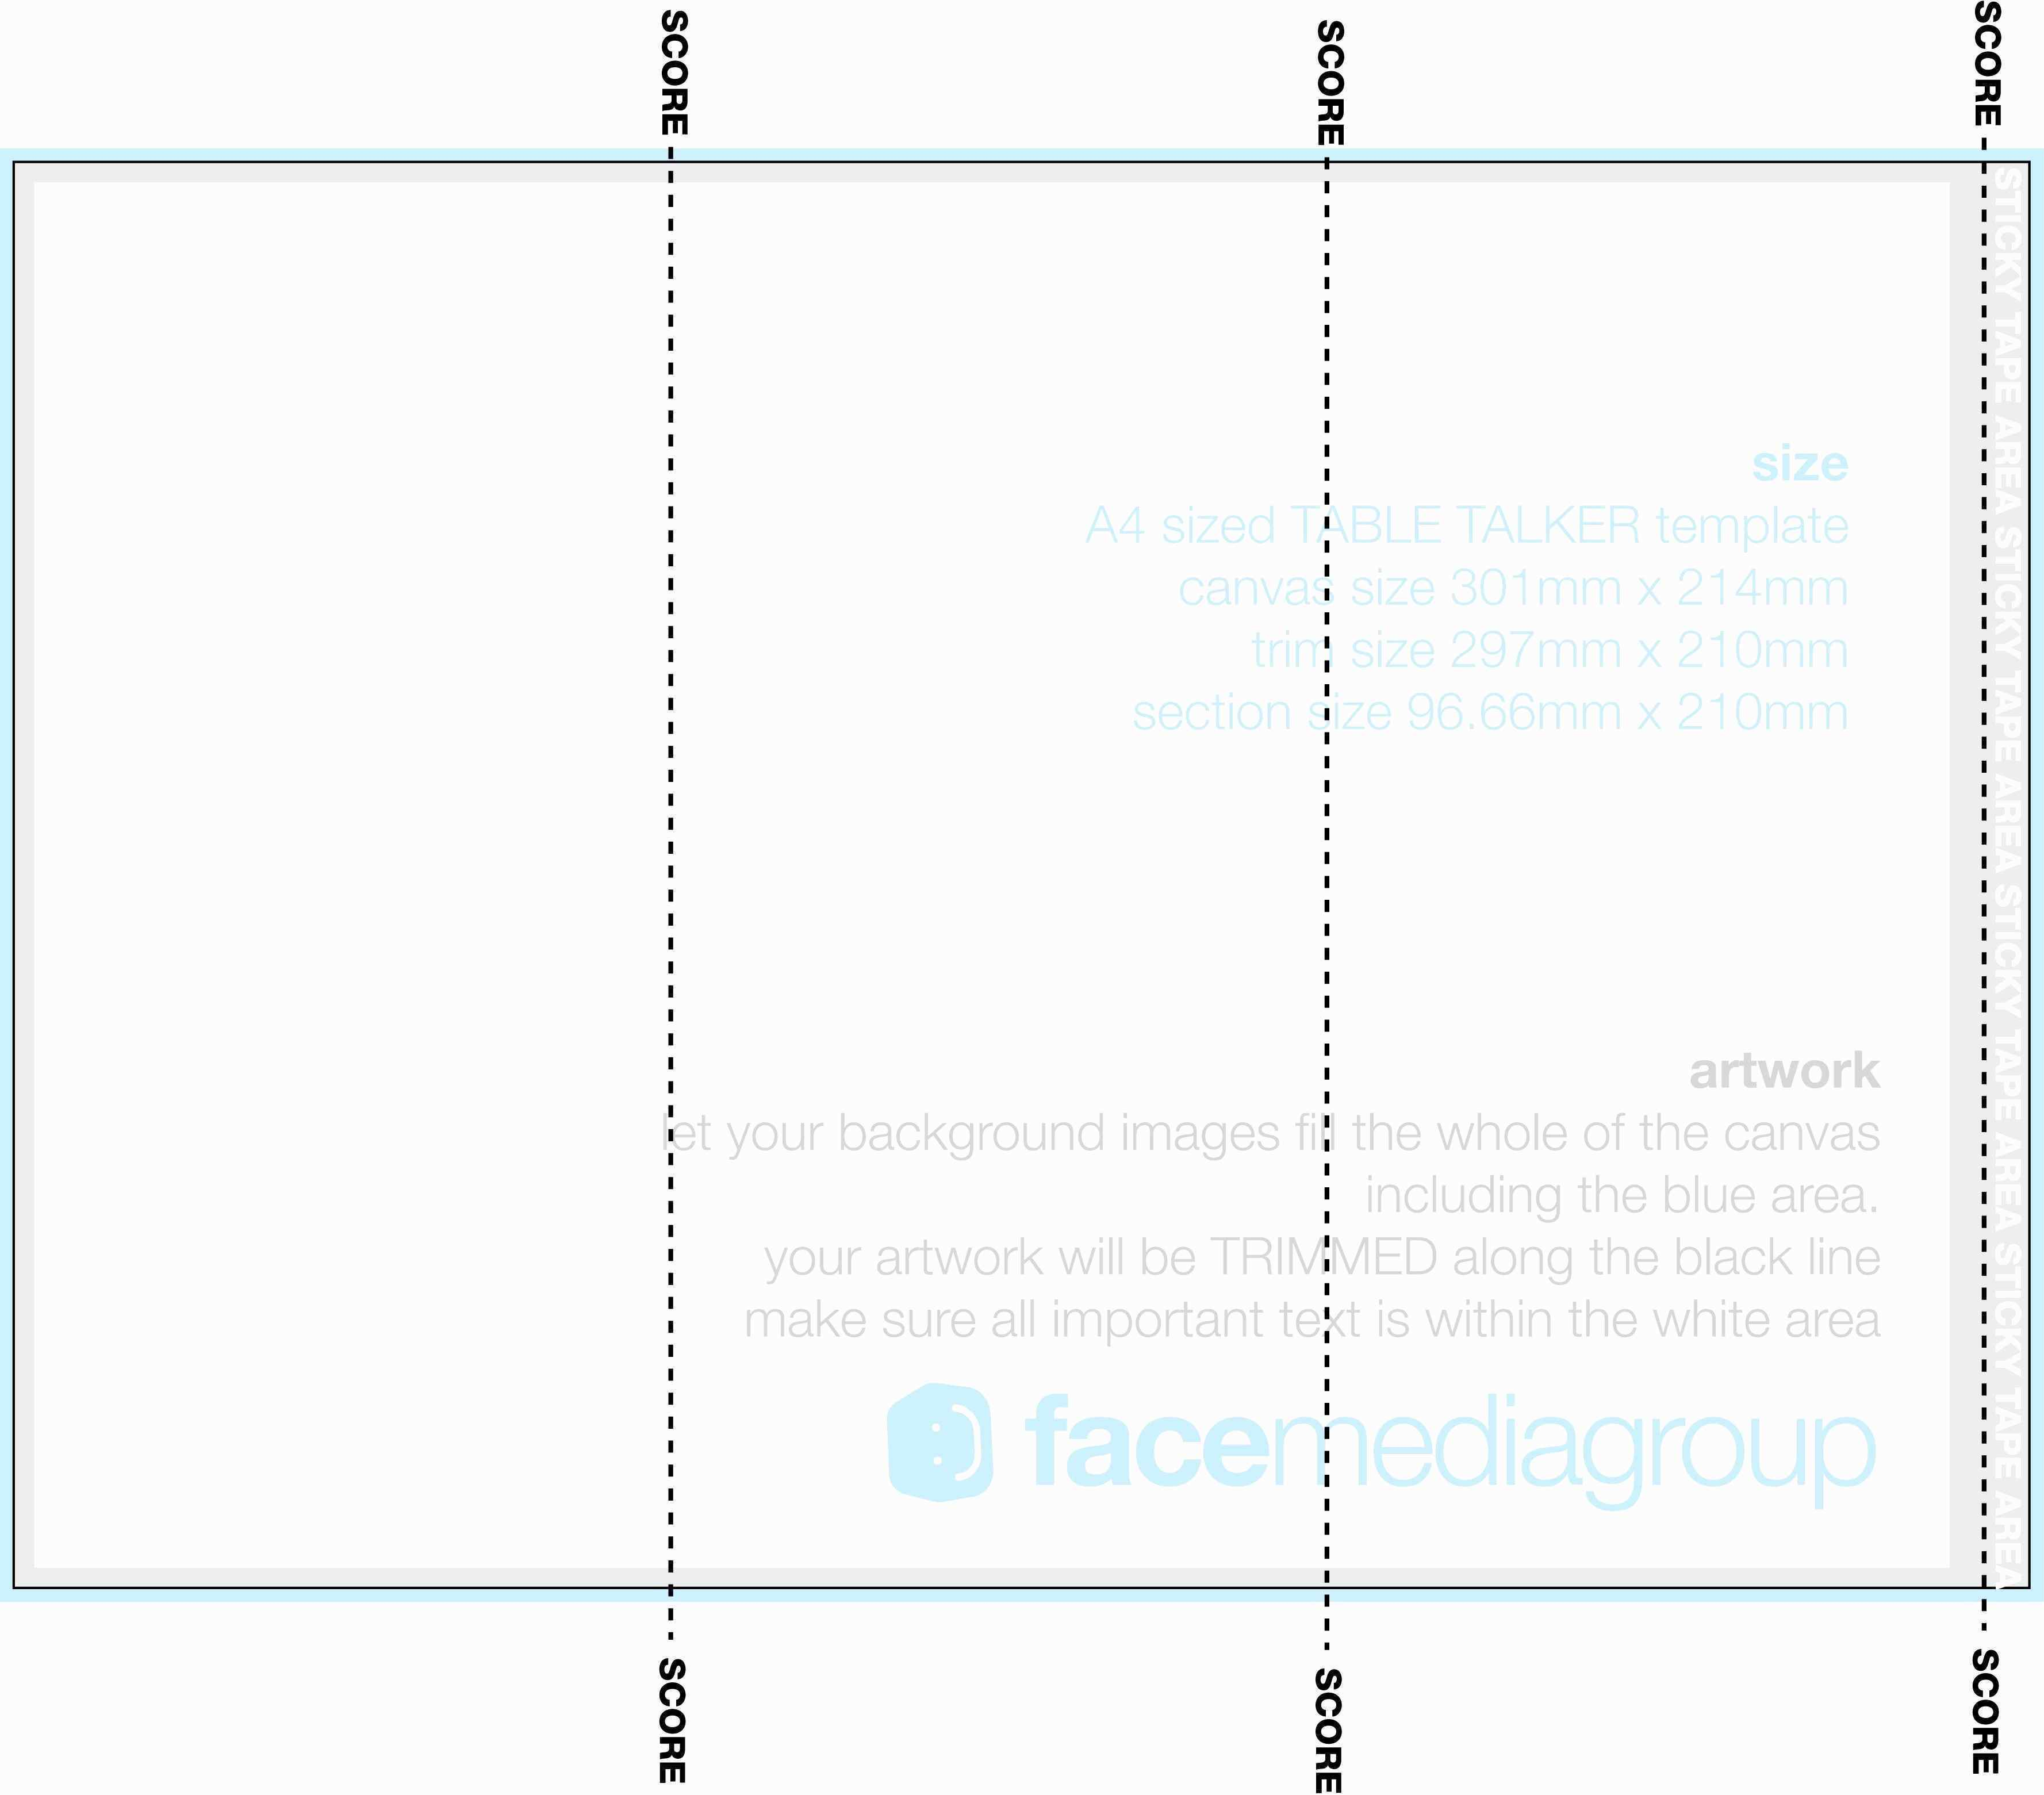 21 Free Tent Place Card Template 21 Per Sheet Layouts for Tent Within Free Template For Place Cards 6 Per Sheet